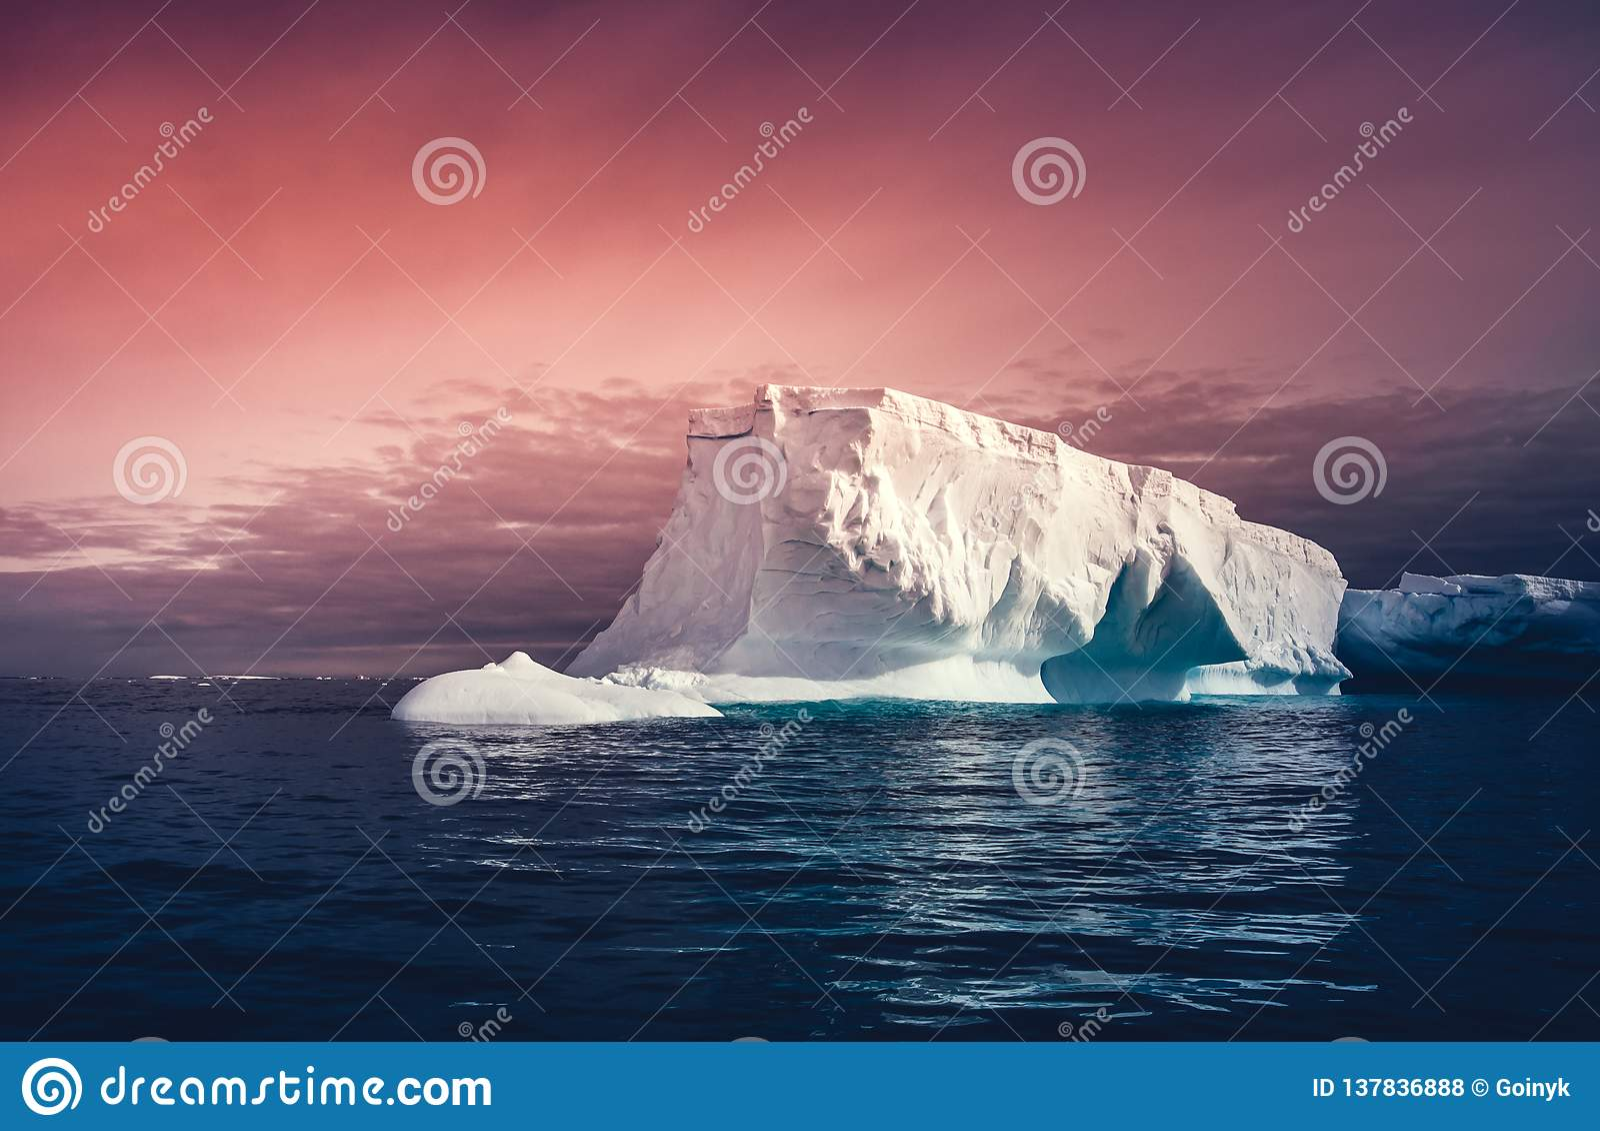 Det enorma isberget på den färgrika himmelbakgrunden